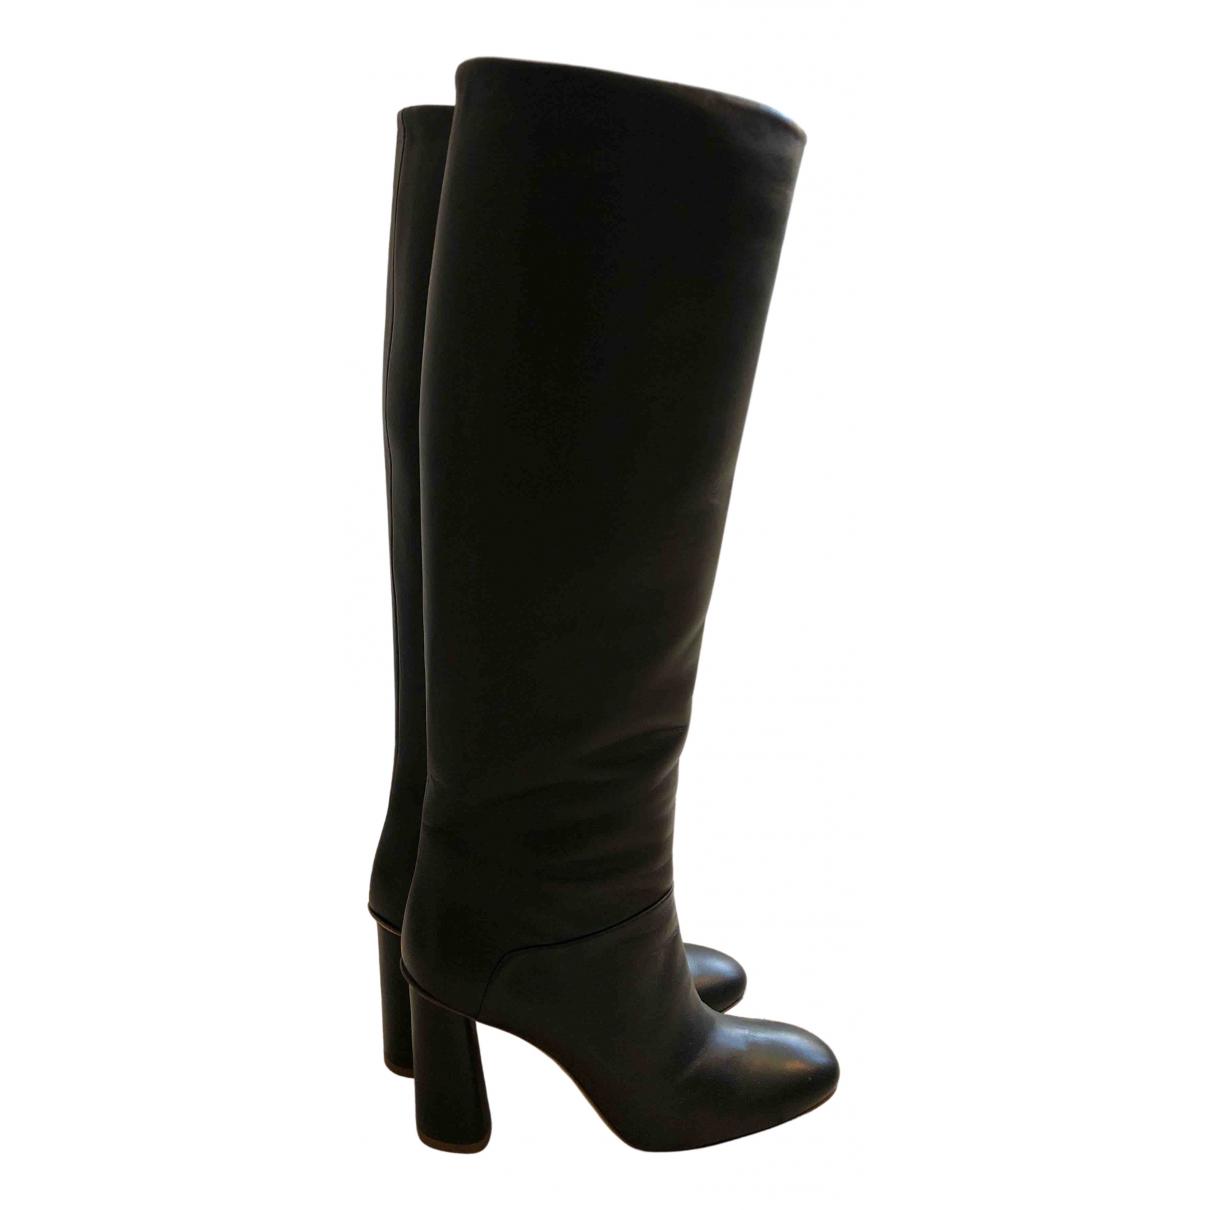 Acne Studios N Black Leather Boots for Women 36 EU